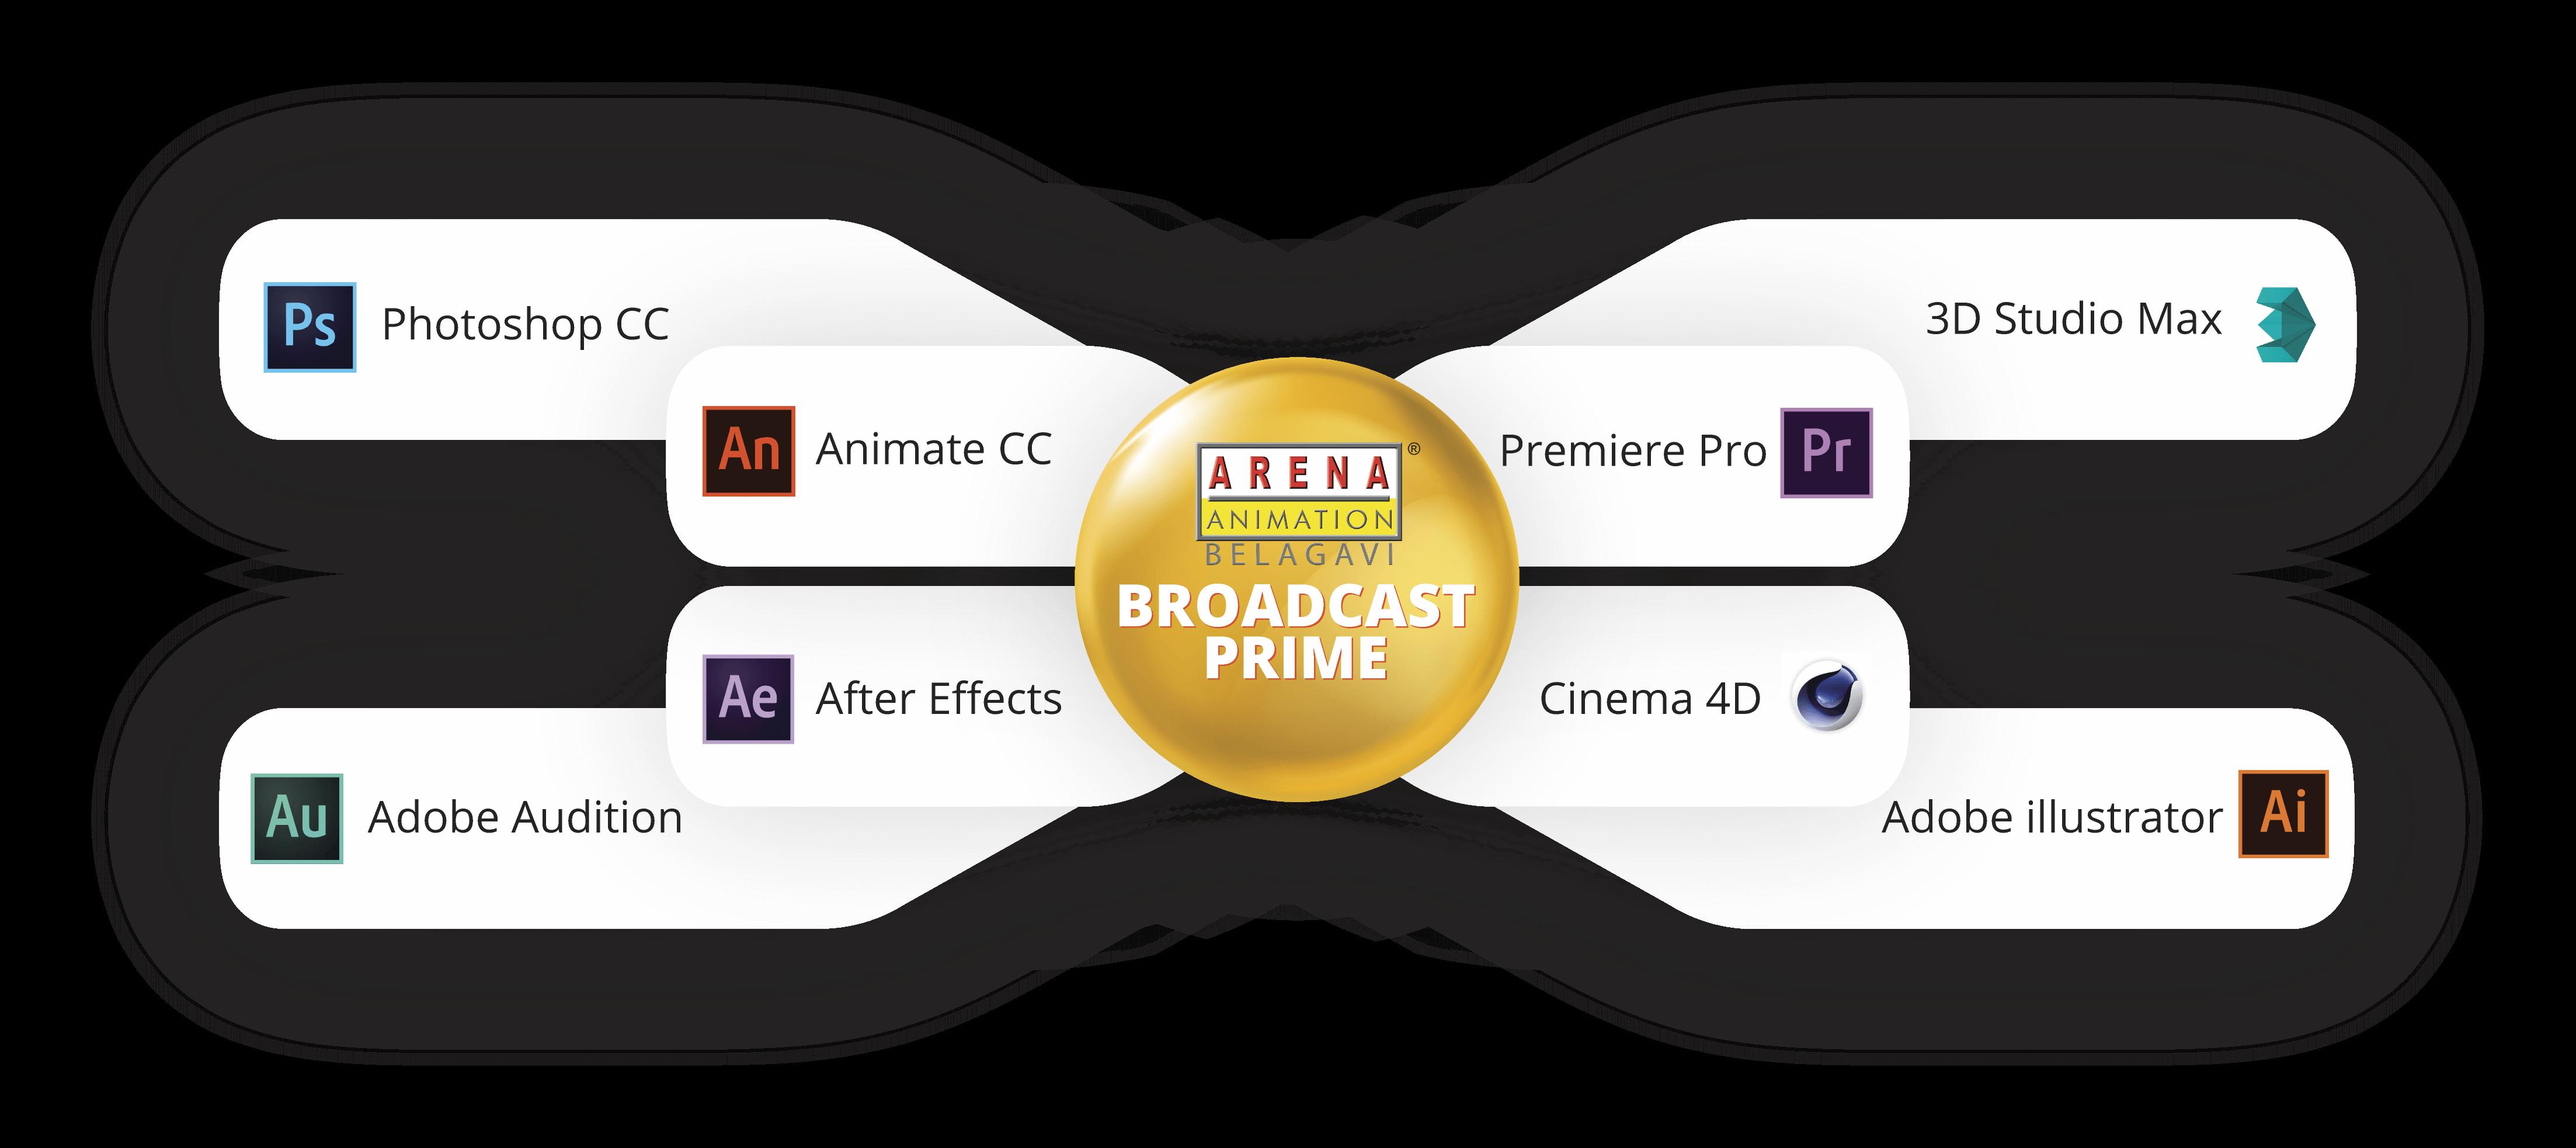 Broadcast Prime | Arena Animation Belagavi